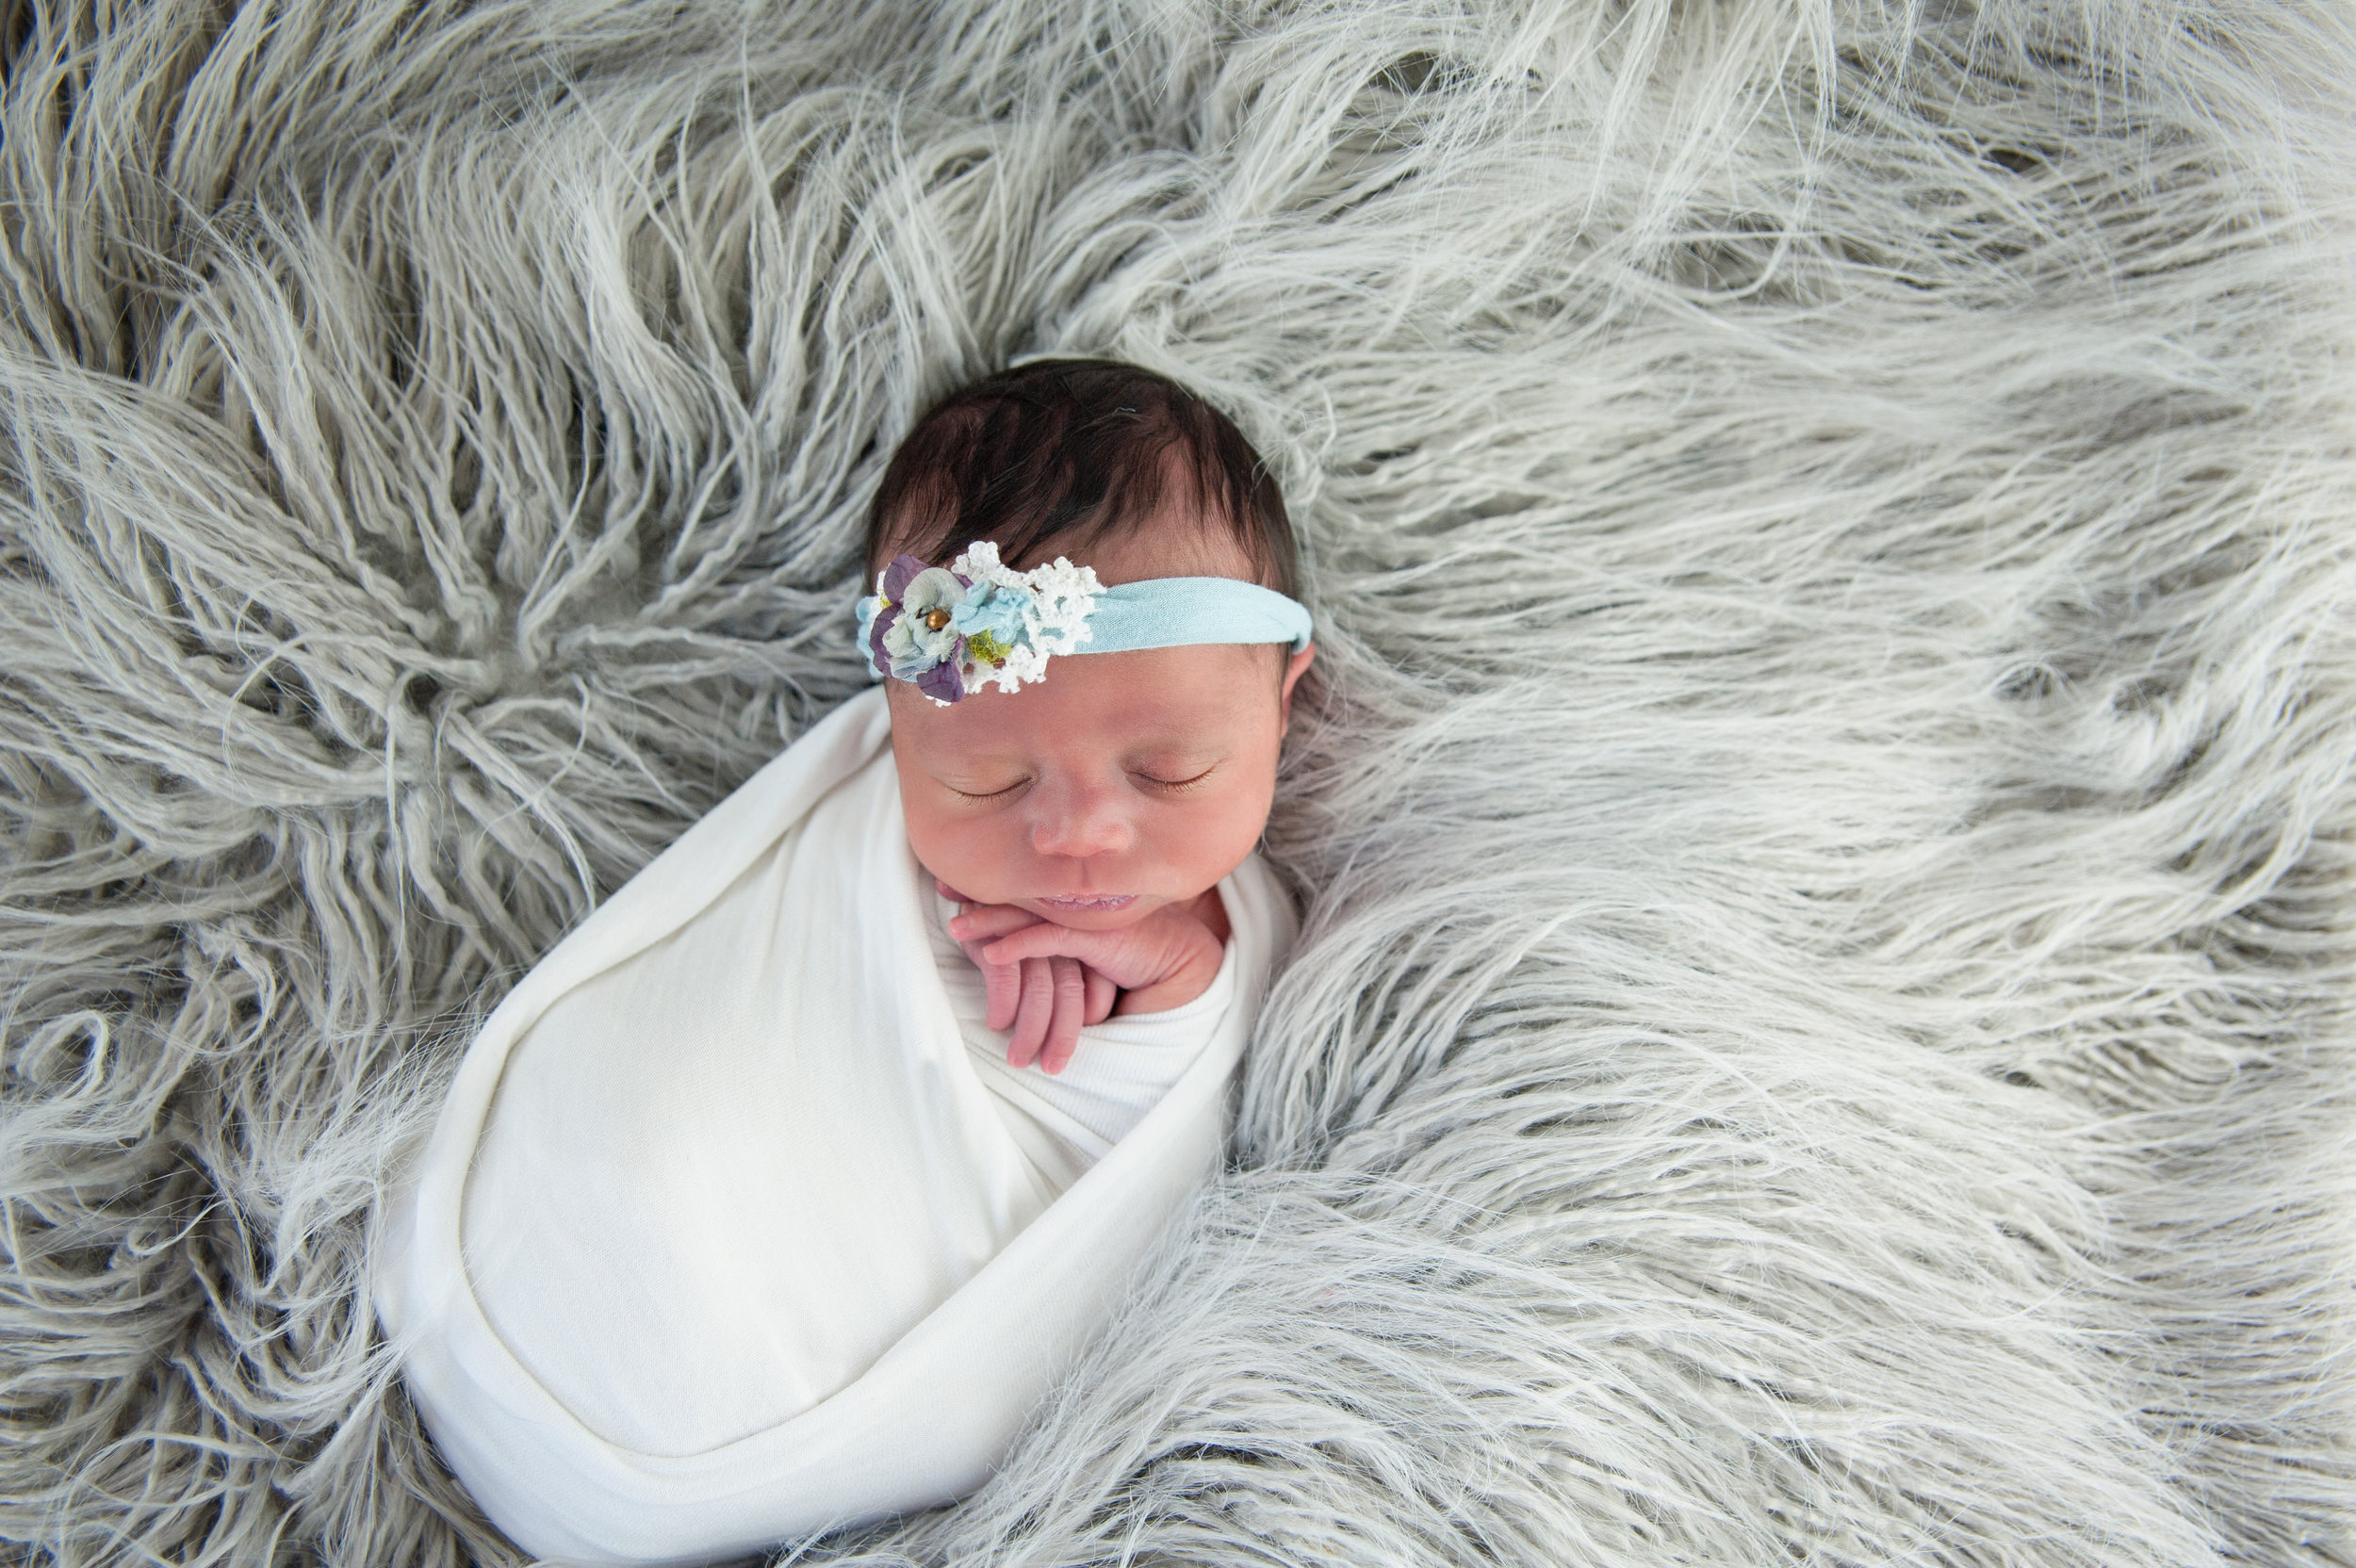 Newborns are best between 3-10 days of age.